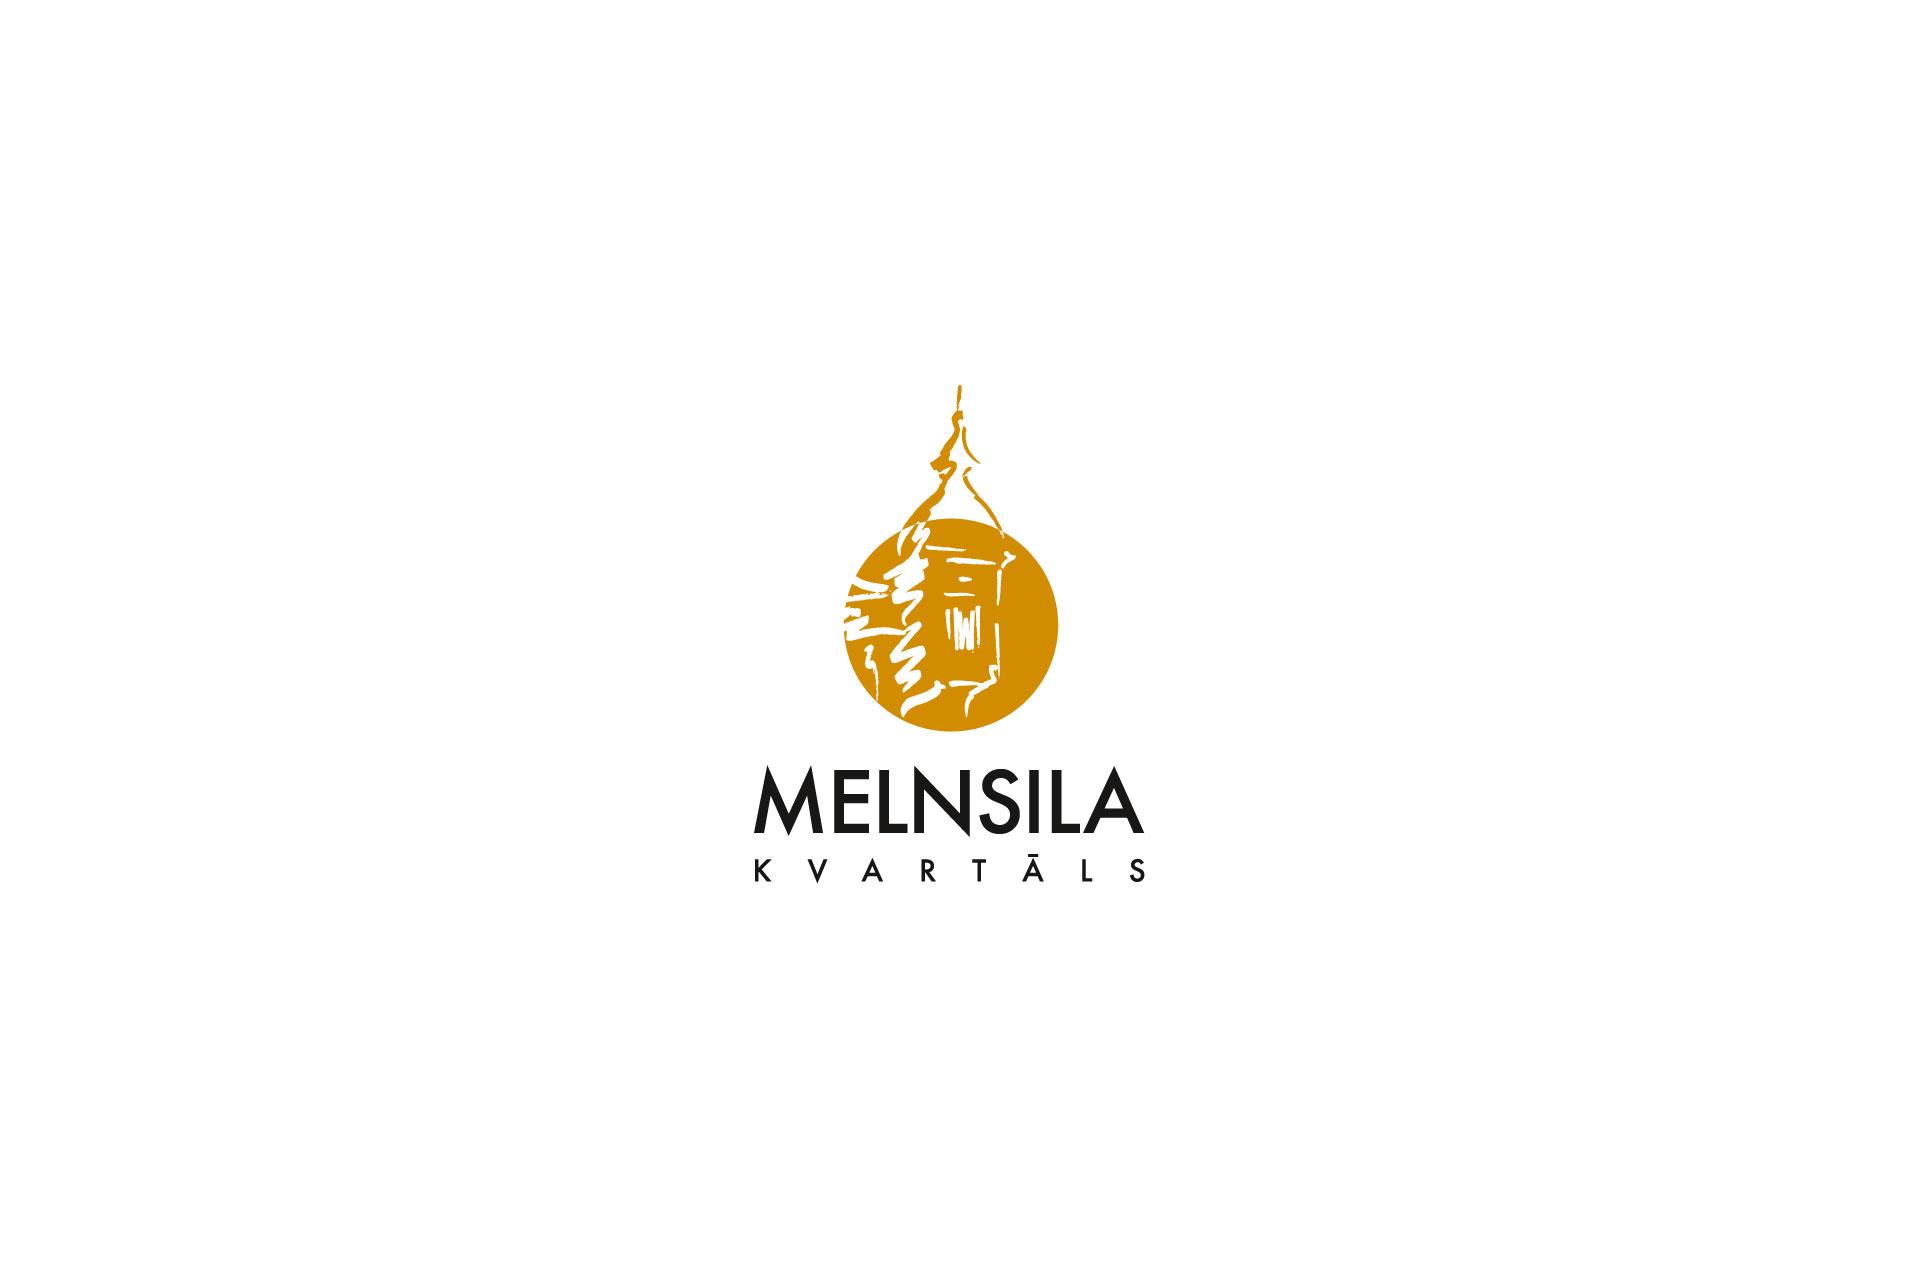 Melnsila-kvartals-logo-Pantone-131-C